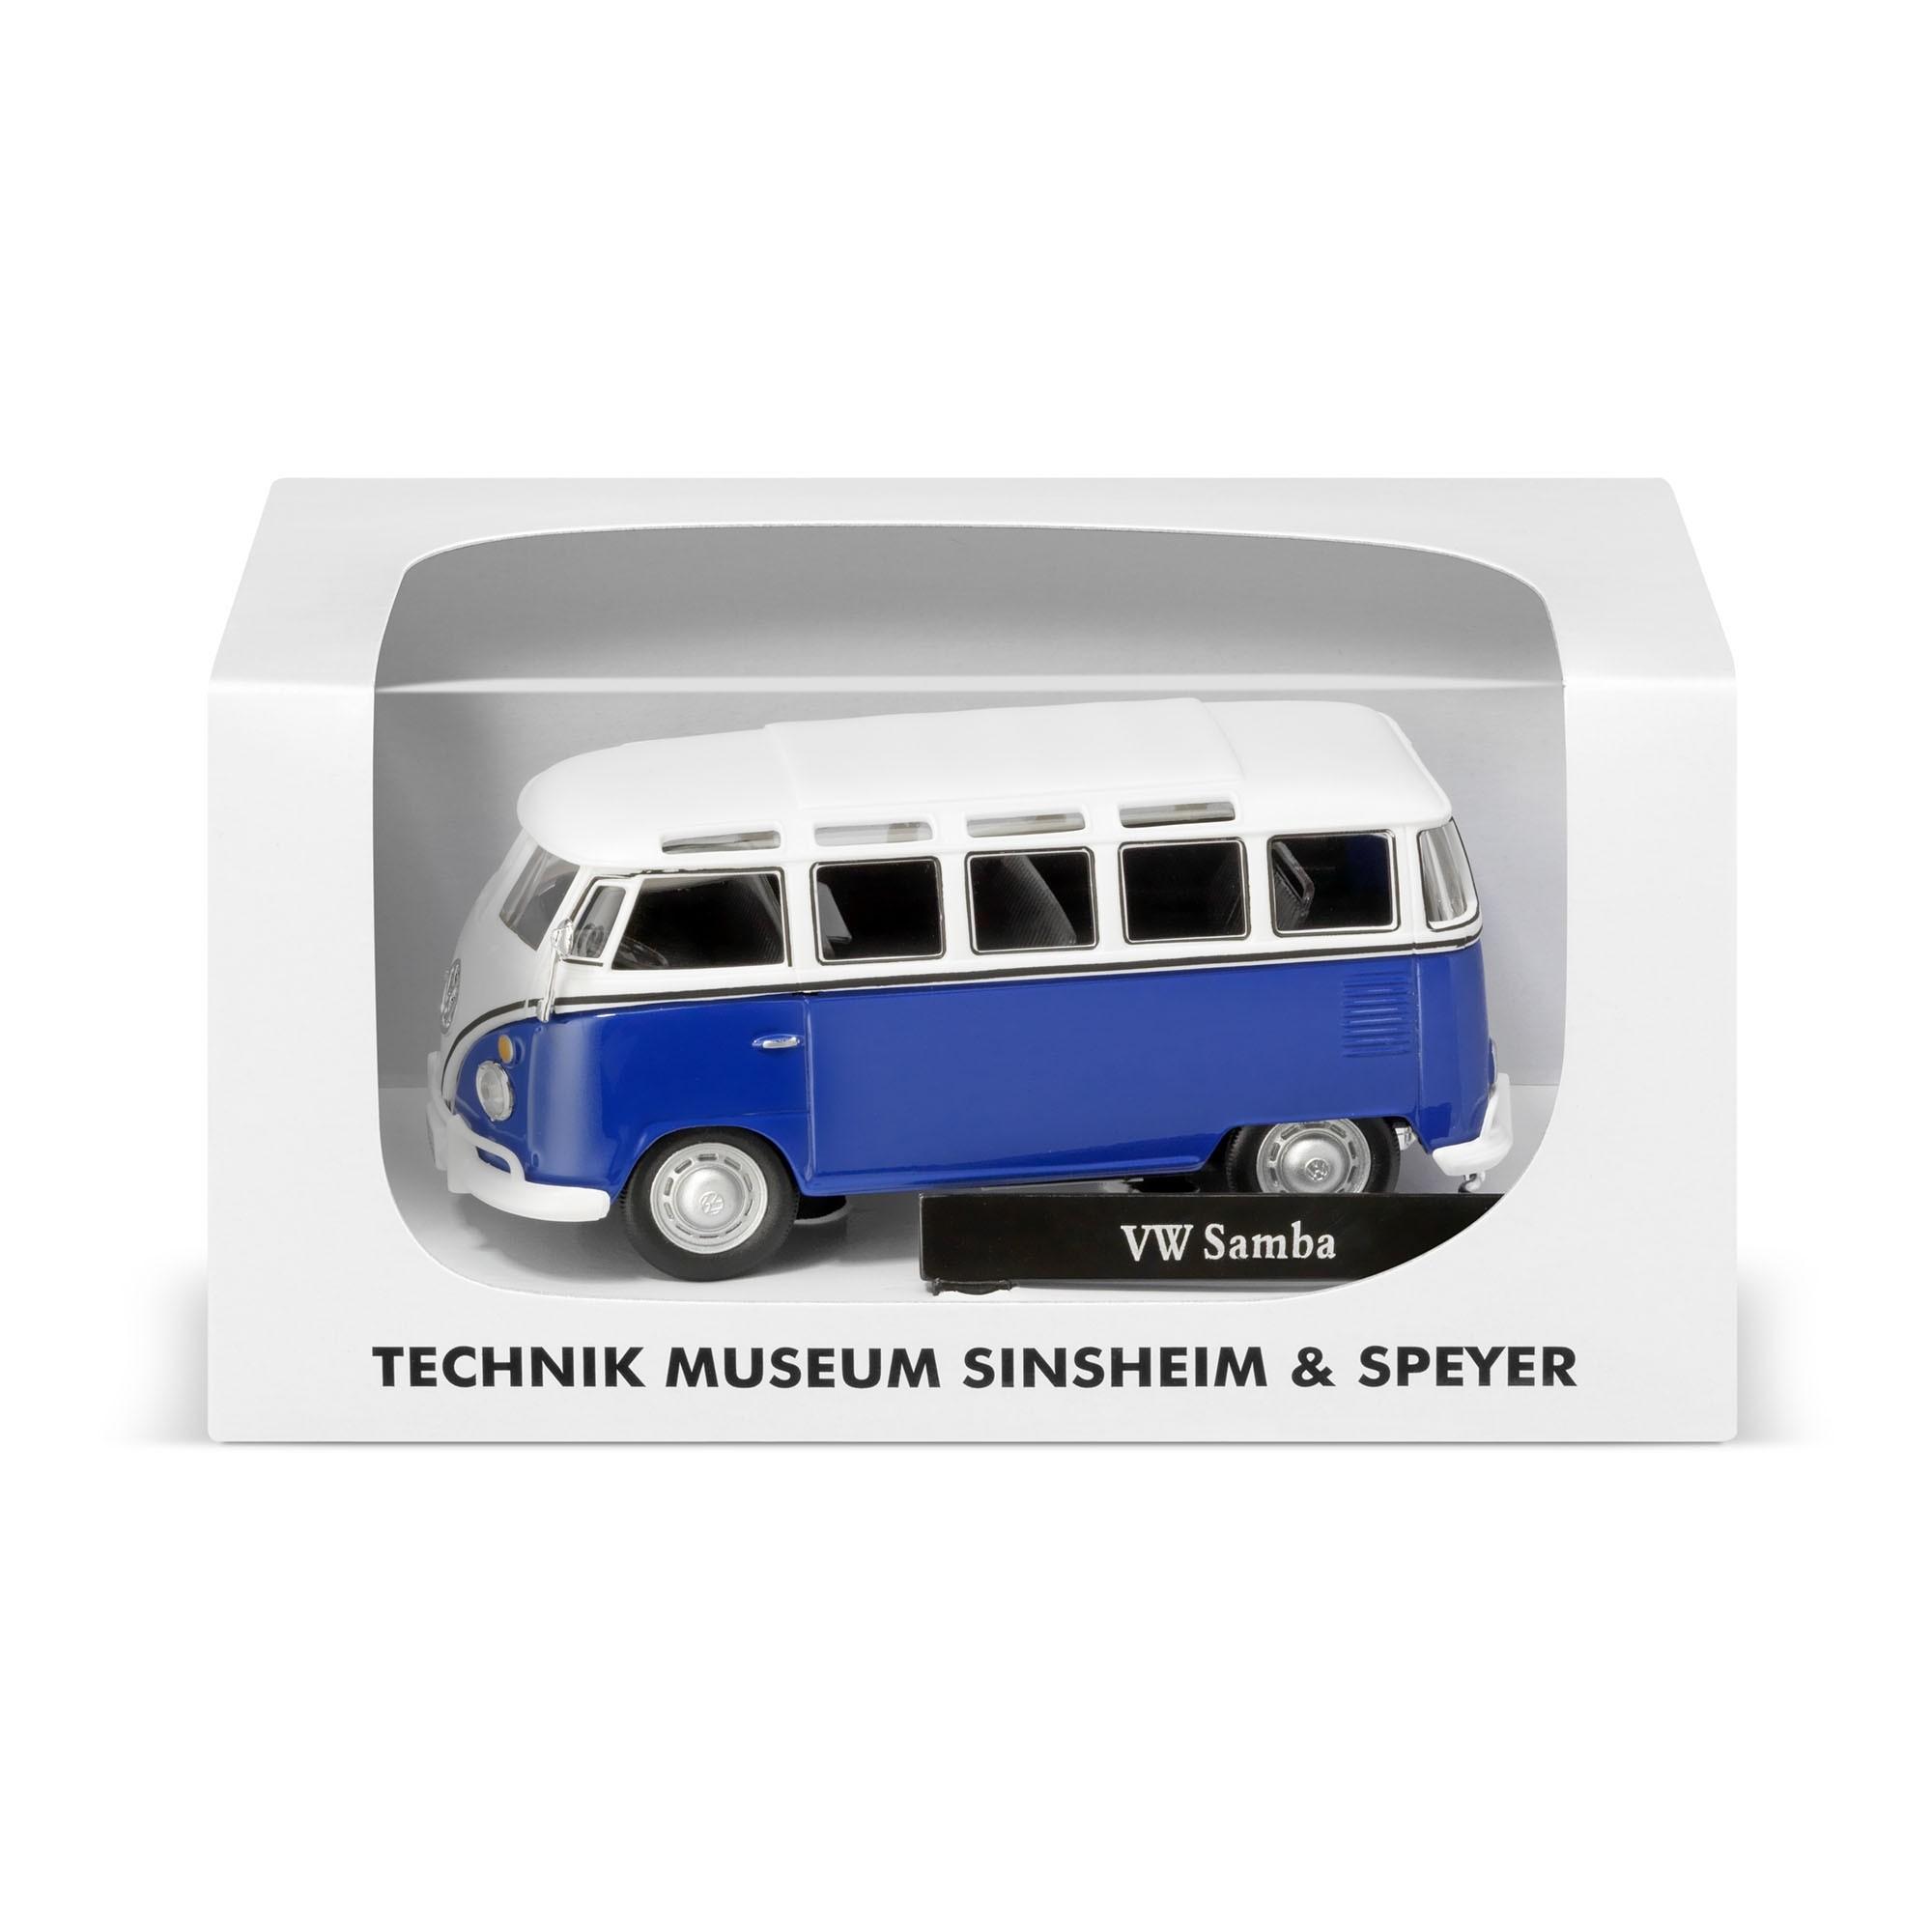 VW Samba - Technik Museen Sinsheim Speyer